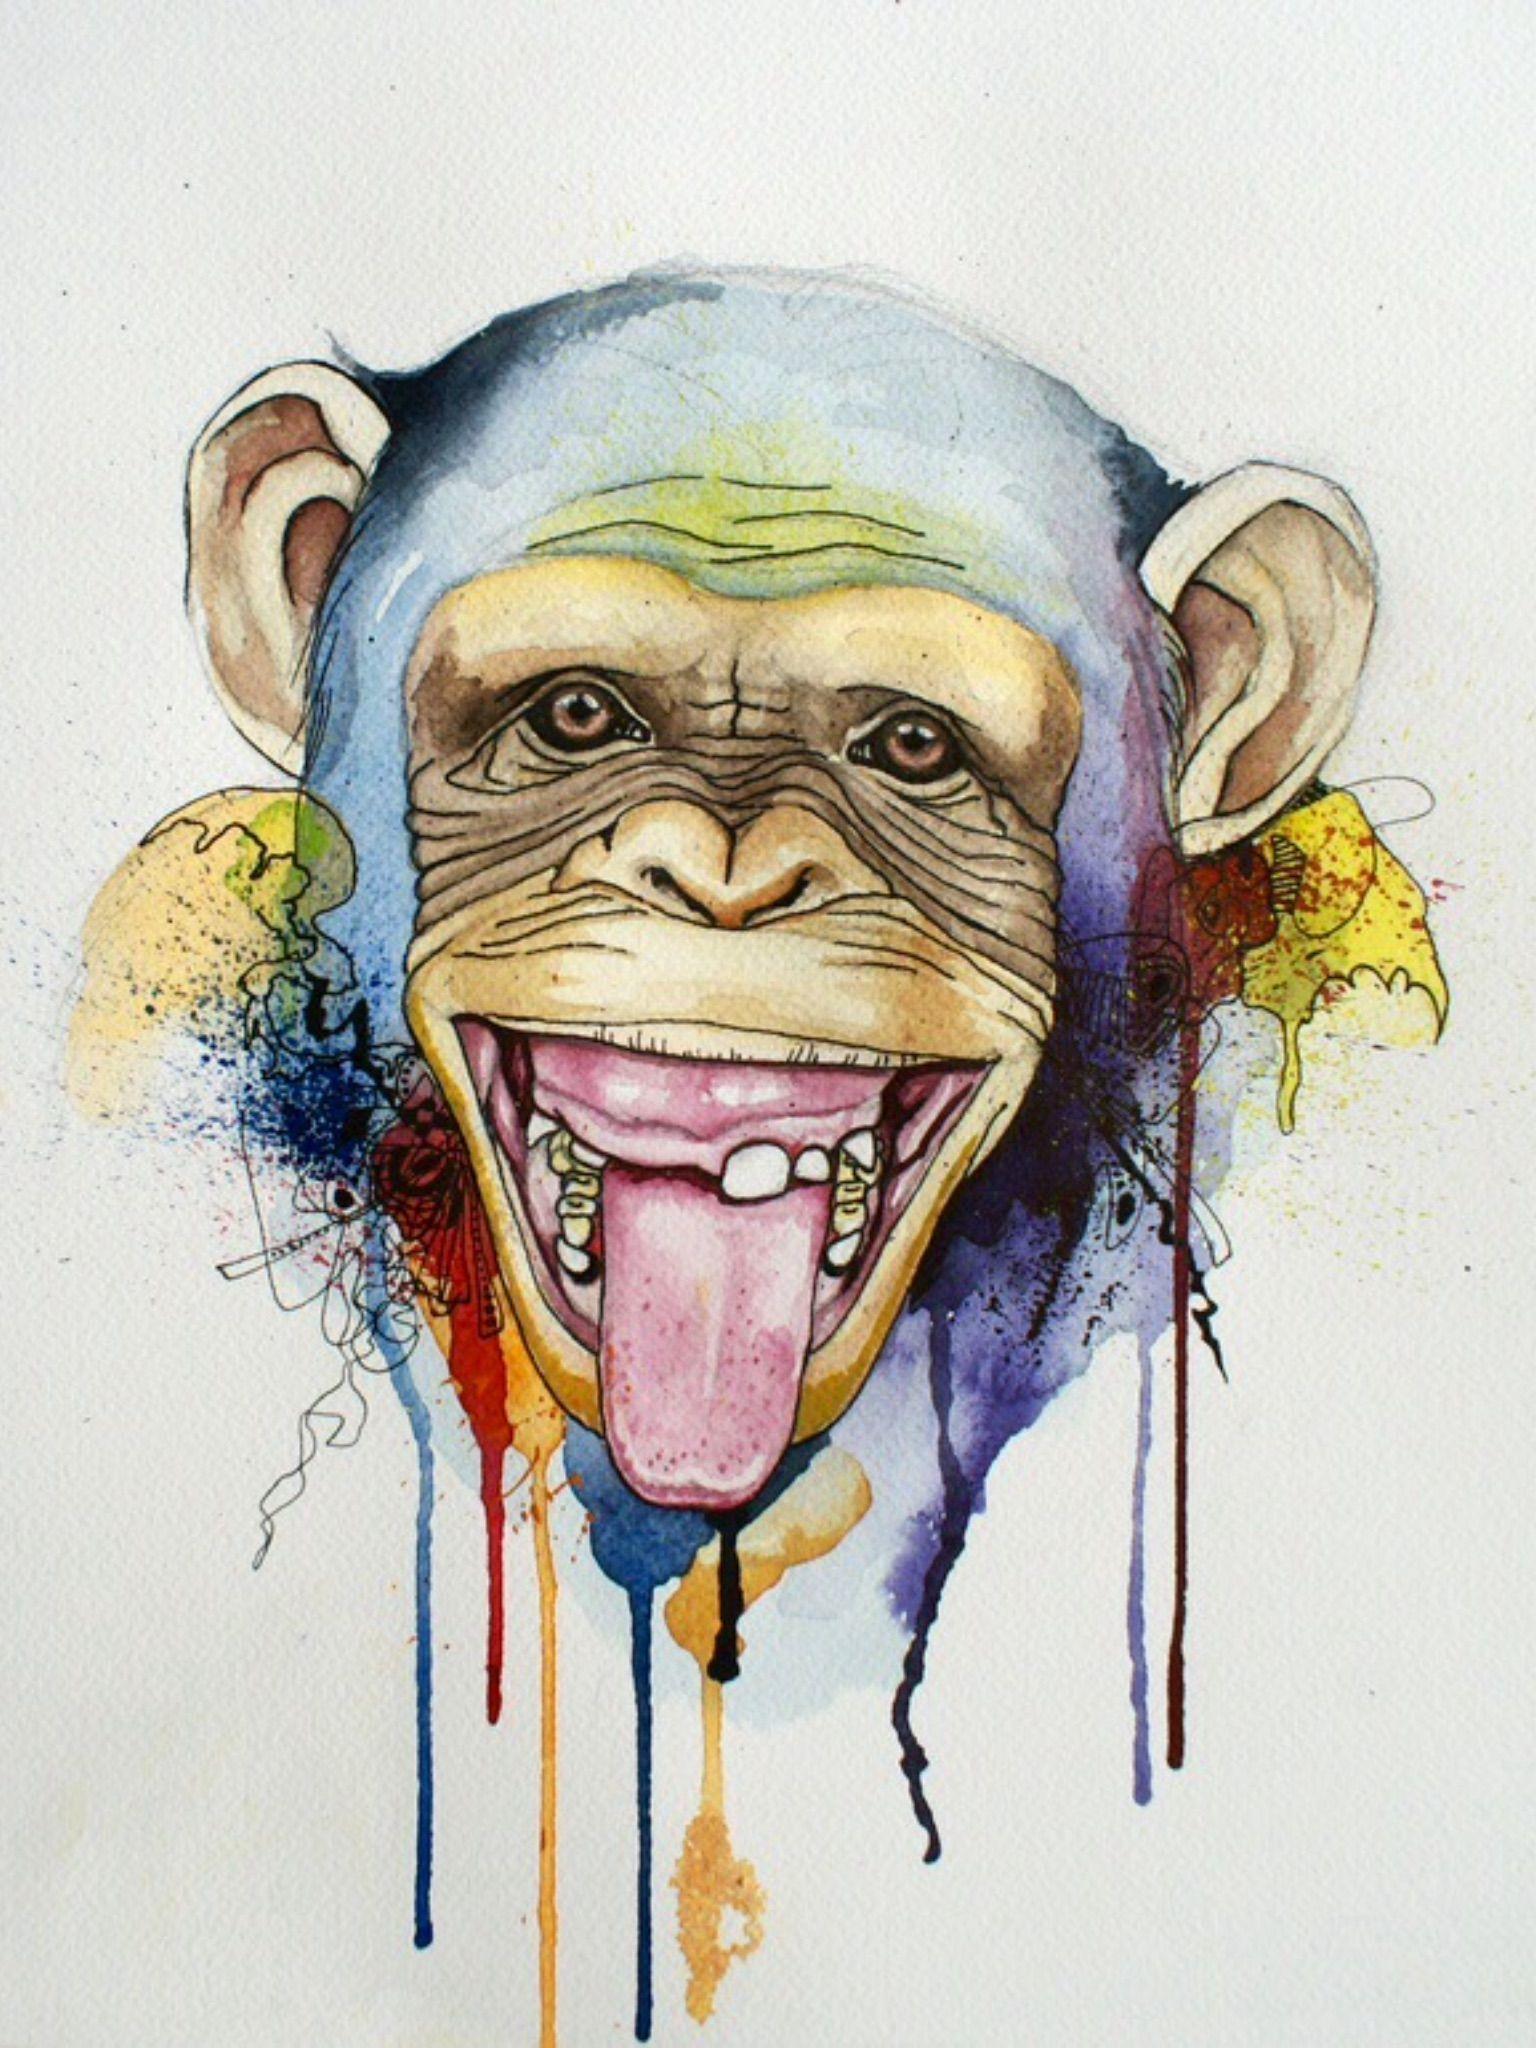 Monkey-ing Around image by Tan2914 | Monkey art, Monkey ...